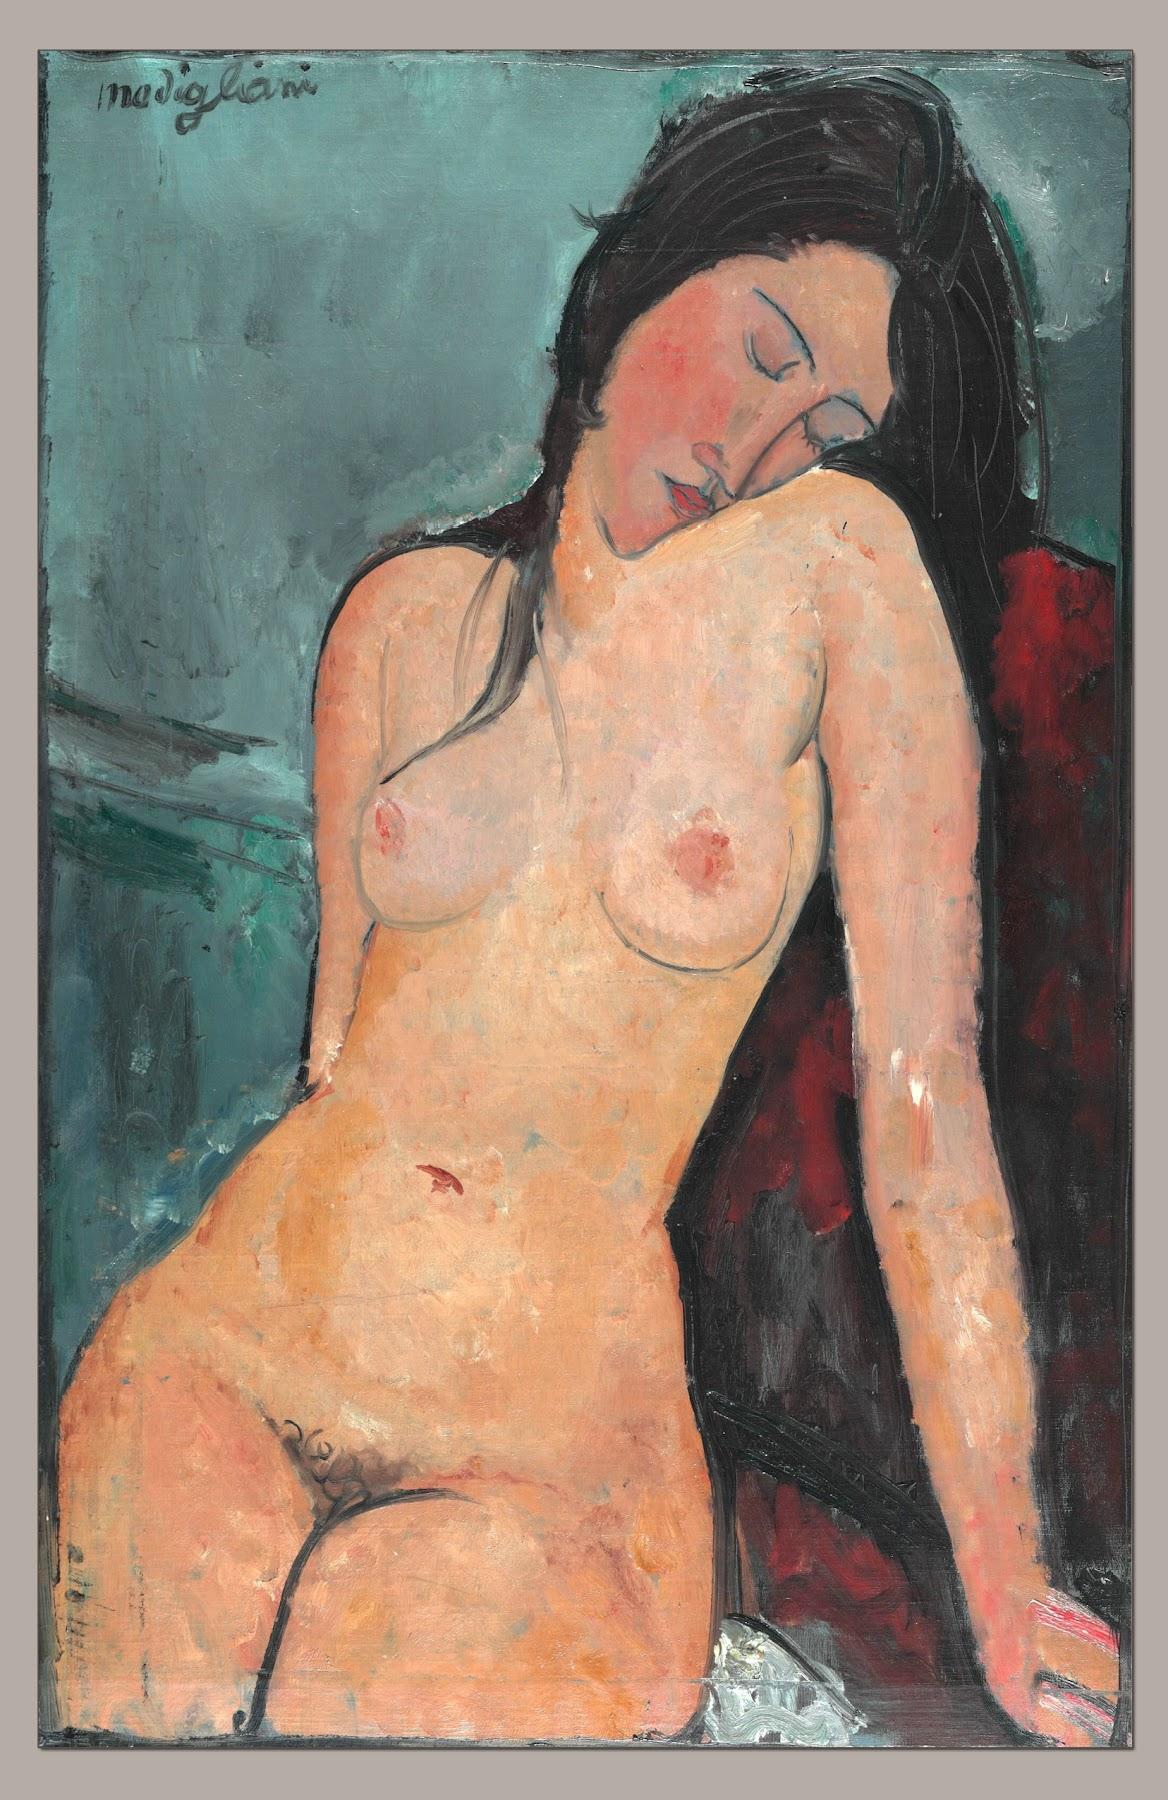 http://4.bp.blogspot.com/-S2EPPtBs0m8/T3L9EV71e1I/AAAAAAAABhQ/QPwtG7ePFf0/s1800/Seated+nude.jpg